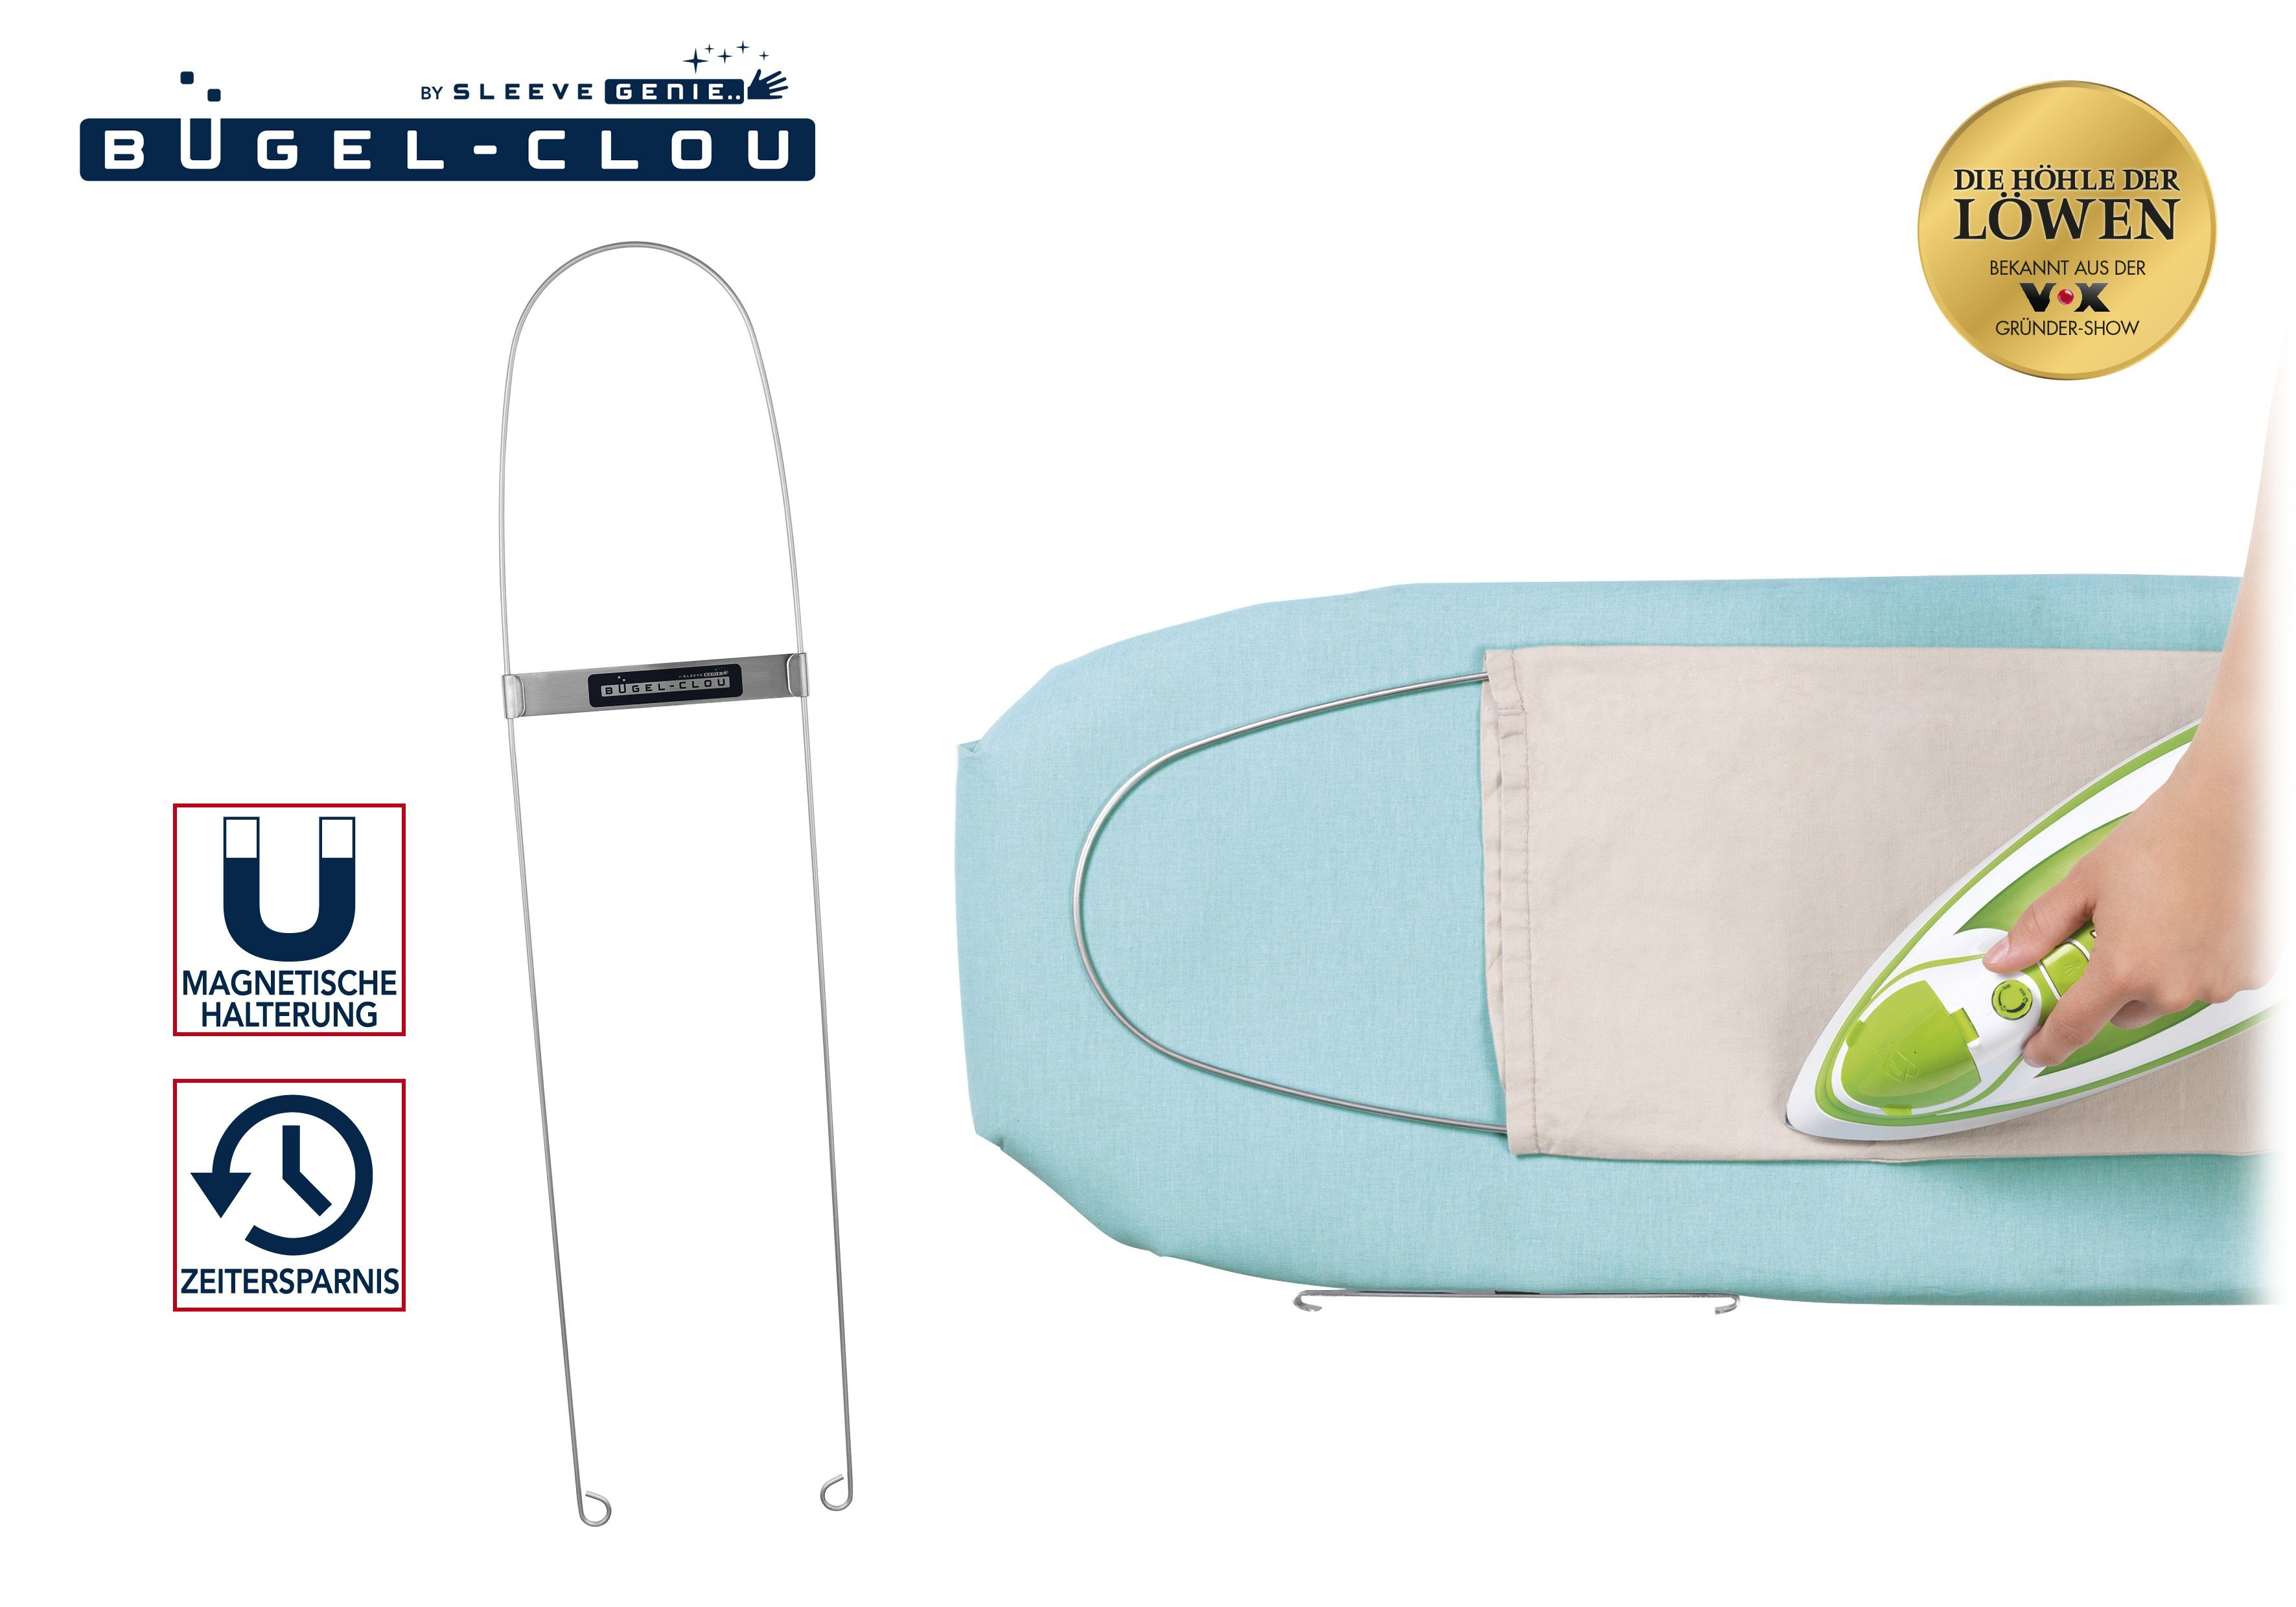 Bügelhilfe Bügel Clou 800 mm Edelstahl für Hosen